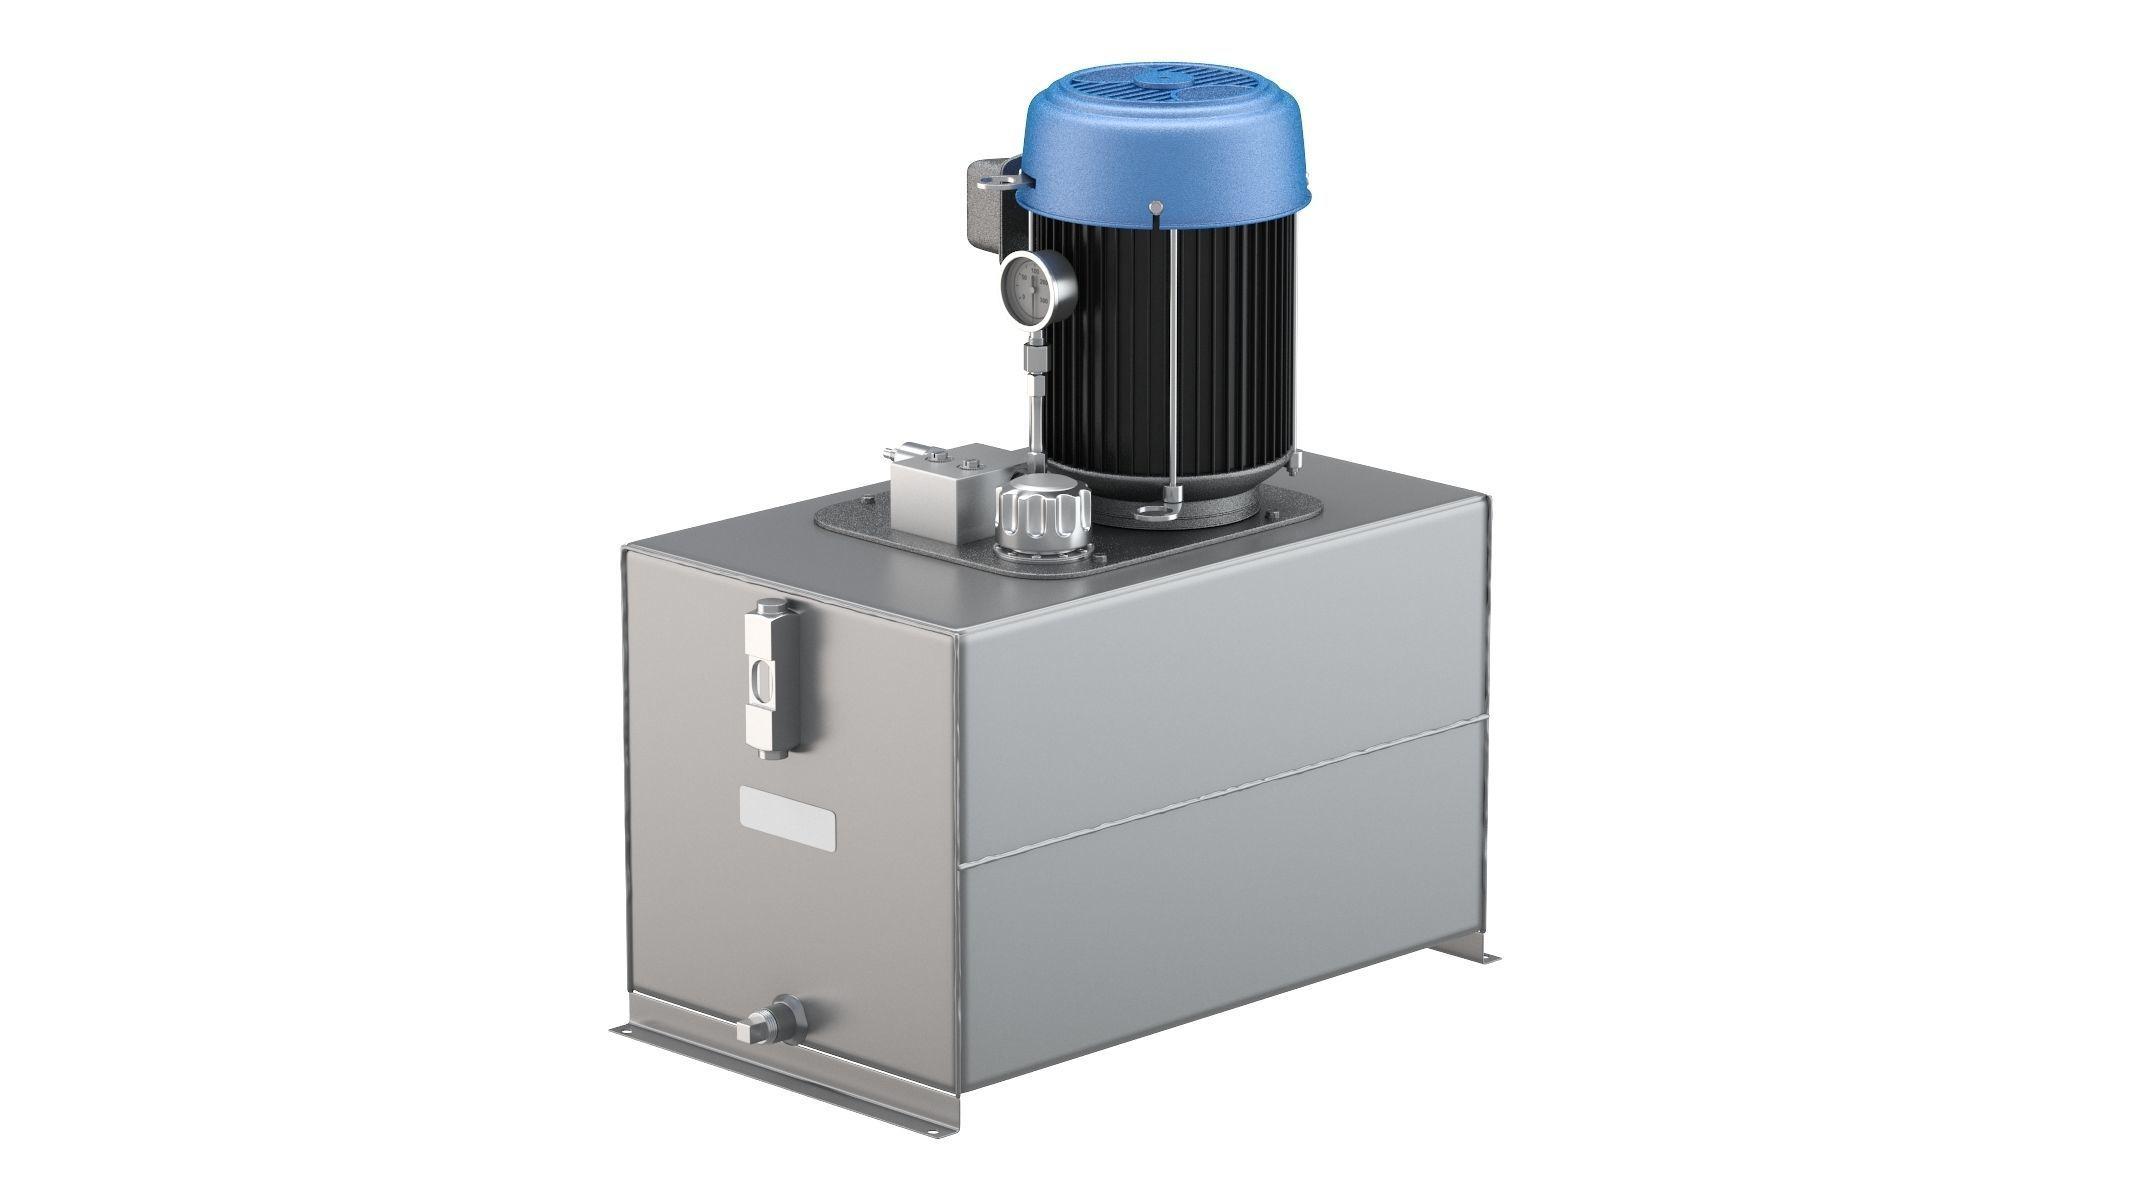 Haldex AC Hydraulic Power System Self-Contained